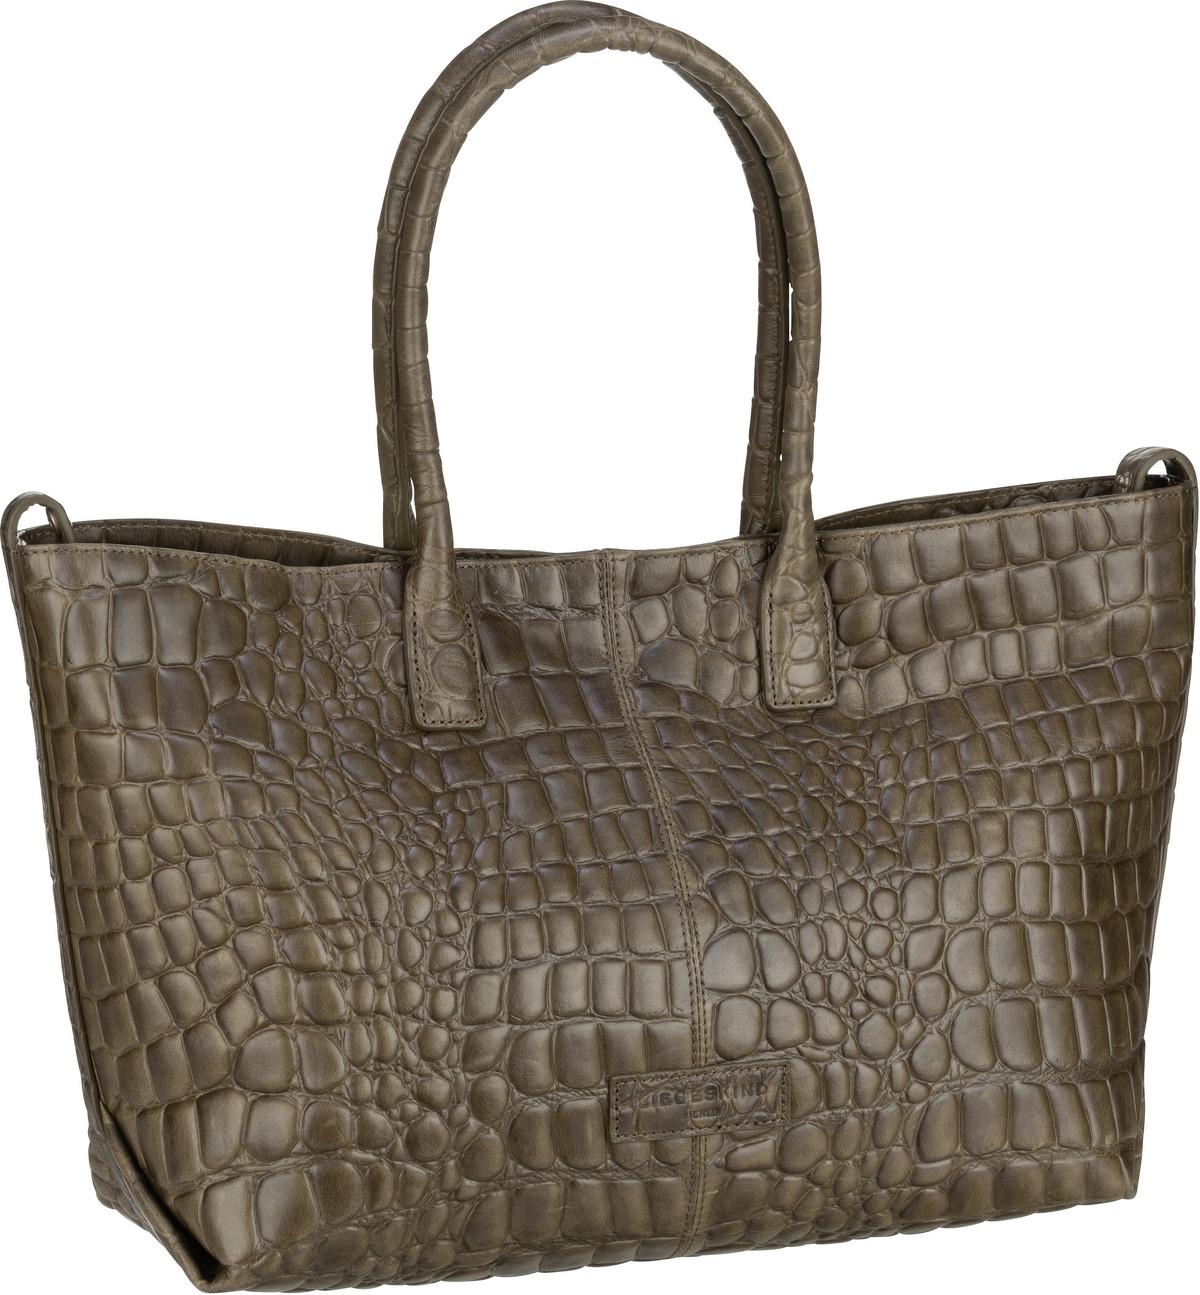 Berlin Handtasche Malibu 2 Chelsea Shopper M Croco Umber Green